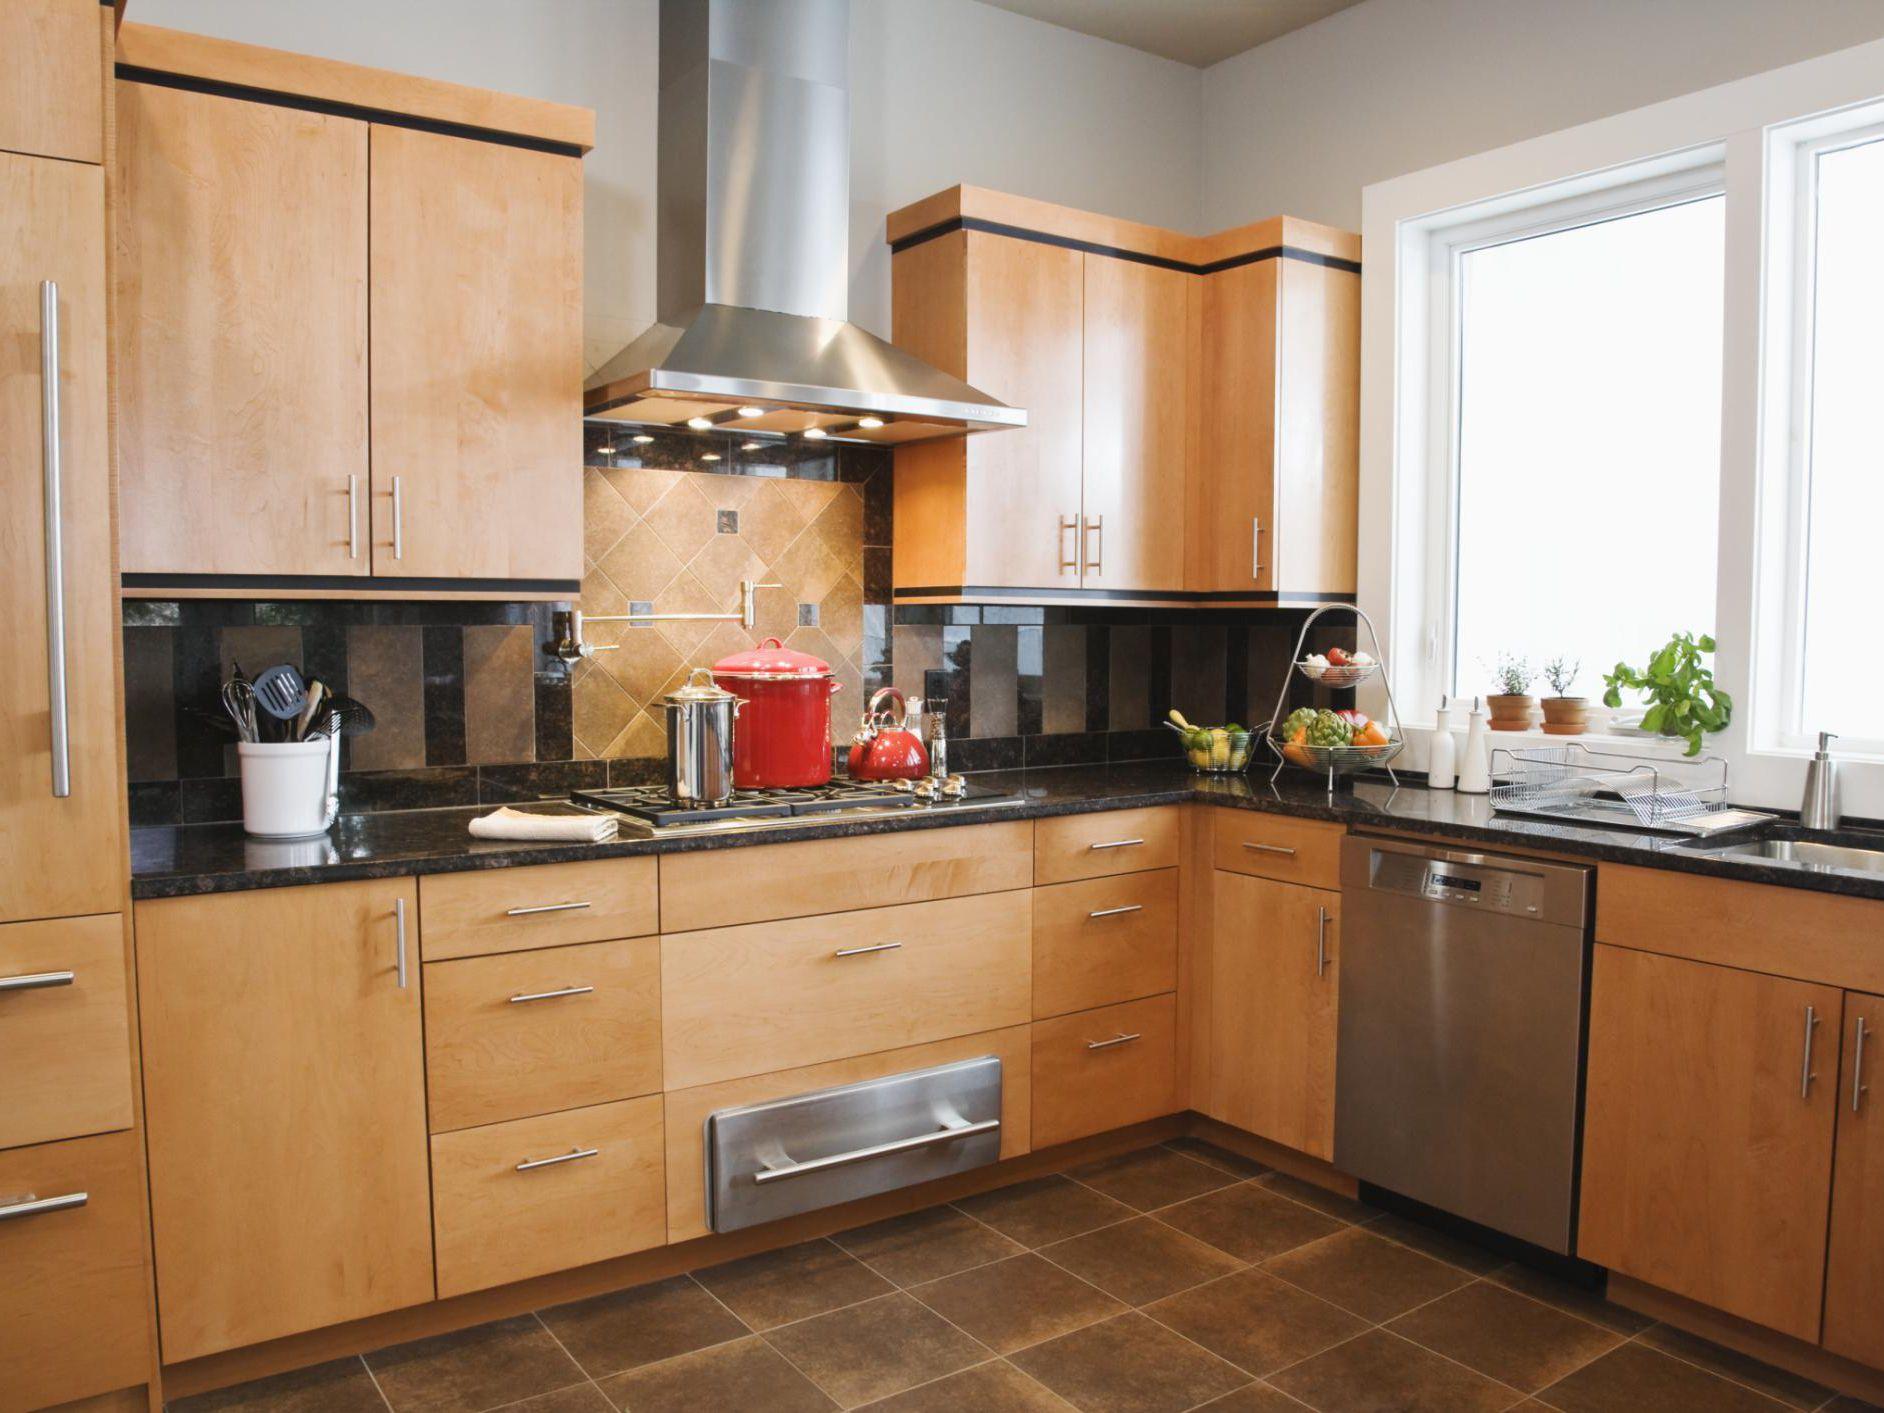 Optimal Kitchen Upper Cabinet Height on